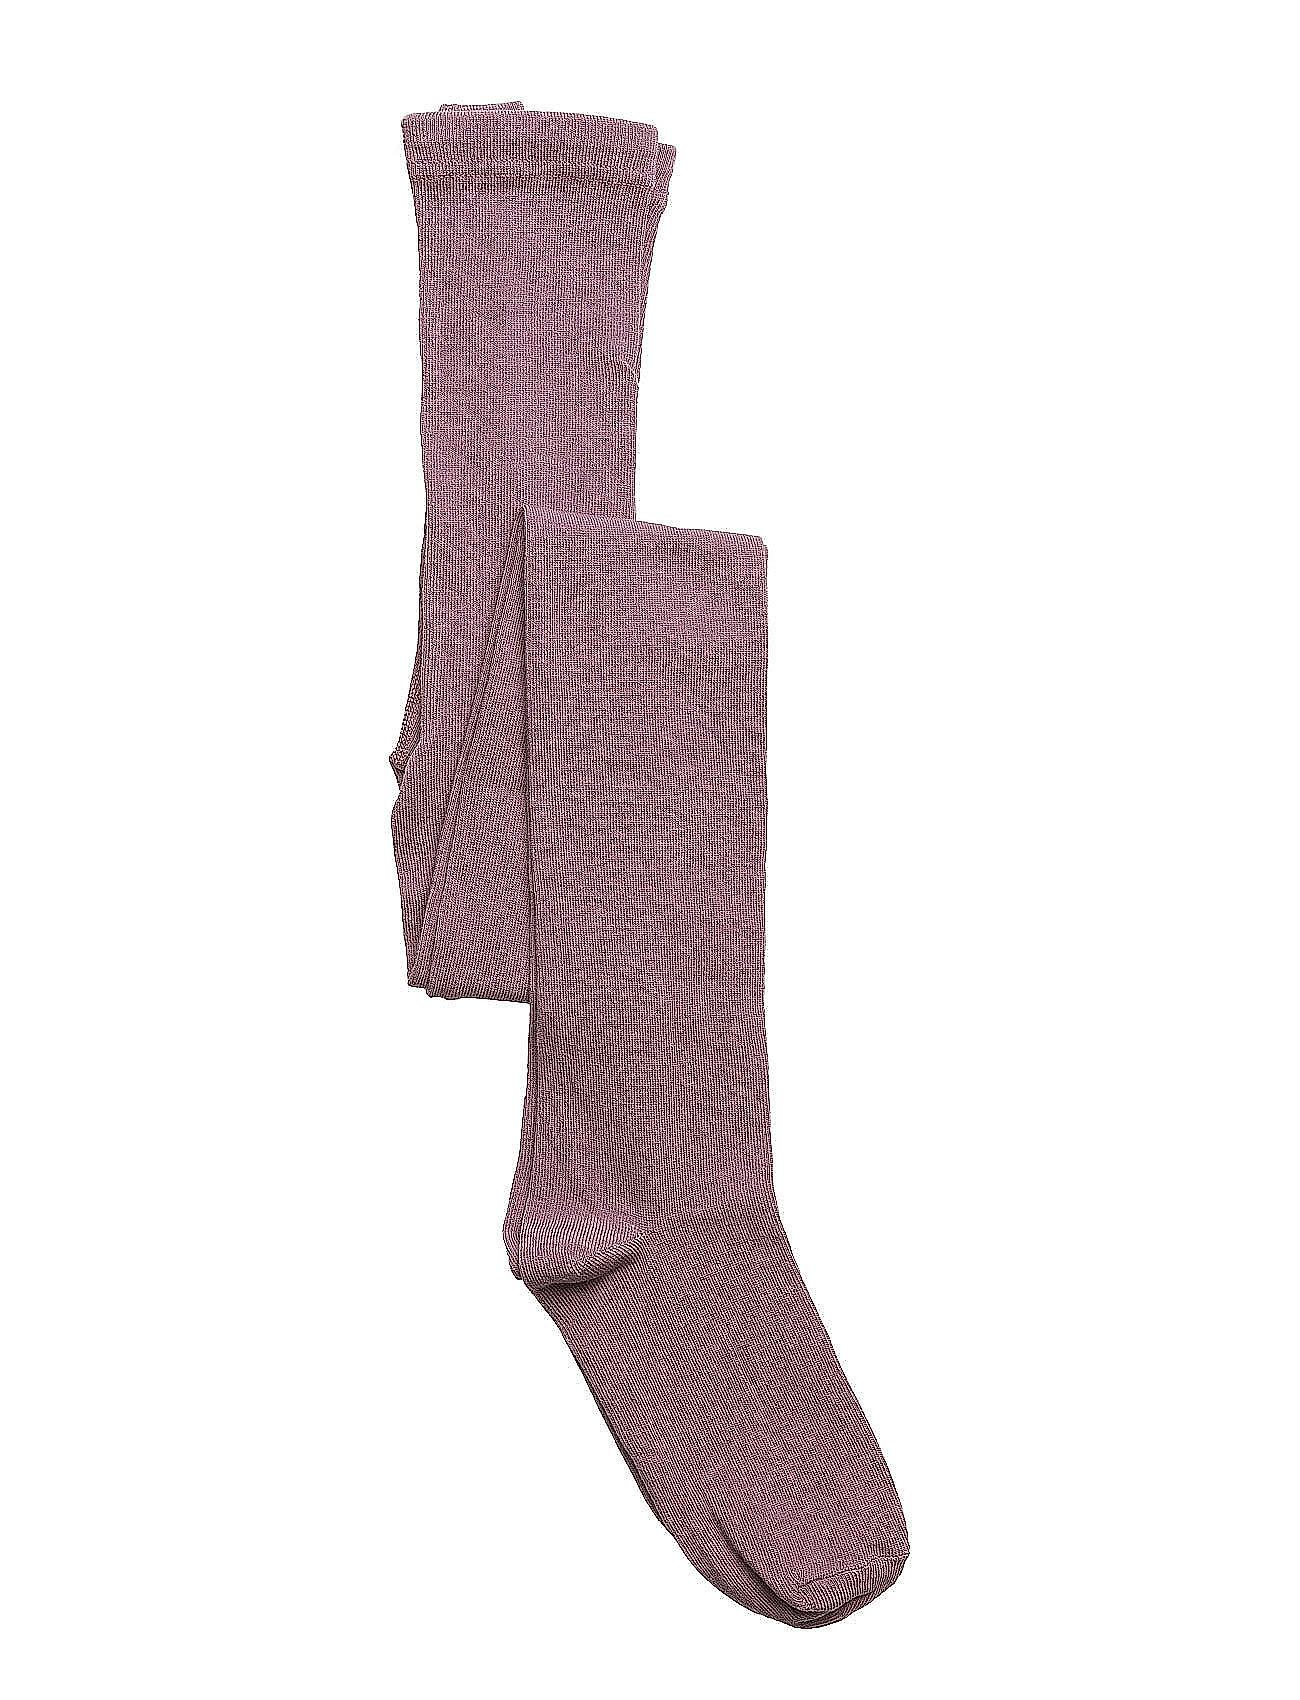 Image of Tight Night & Underwear Tights Lilla Melton (3452090367)